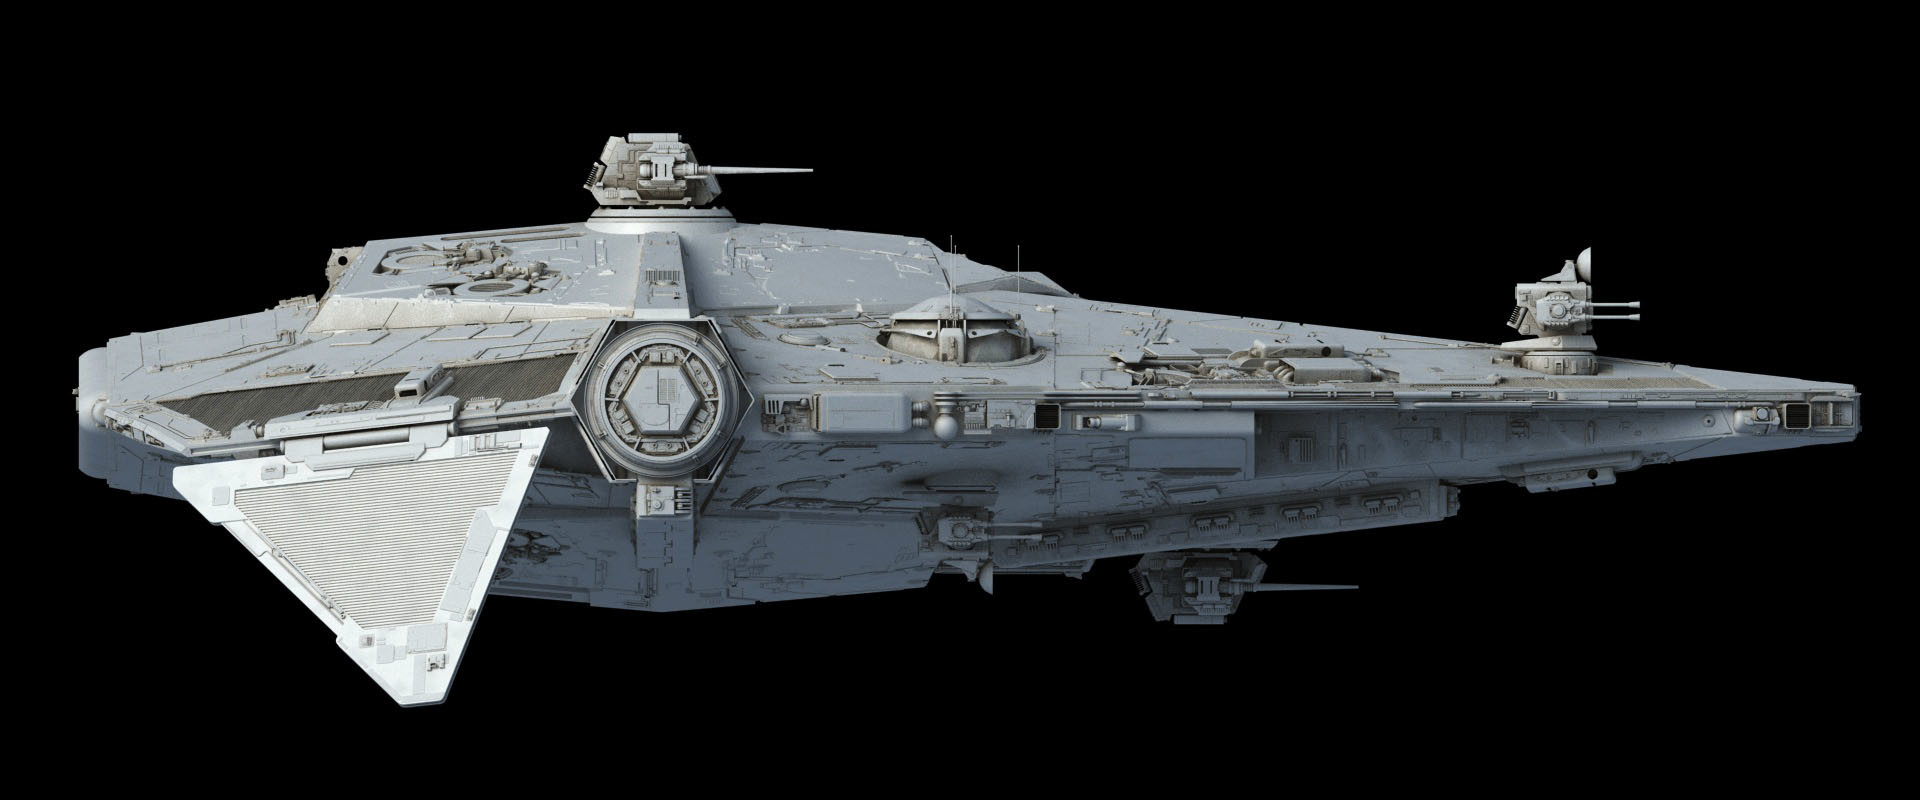 Ansel hsiao sloop starboard